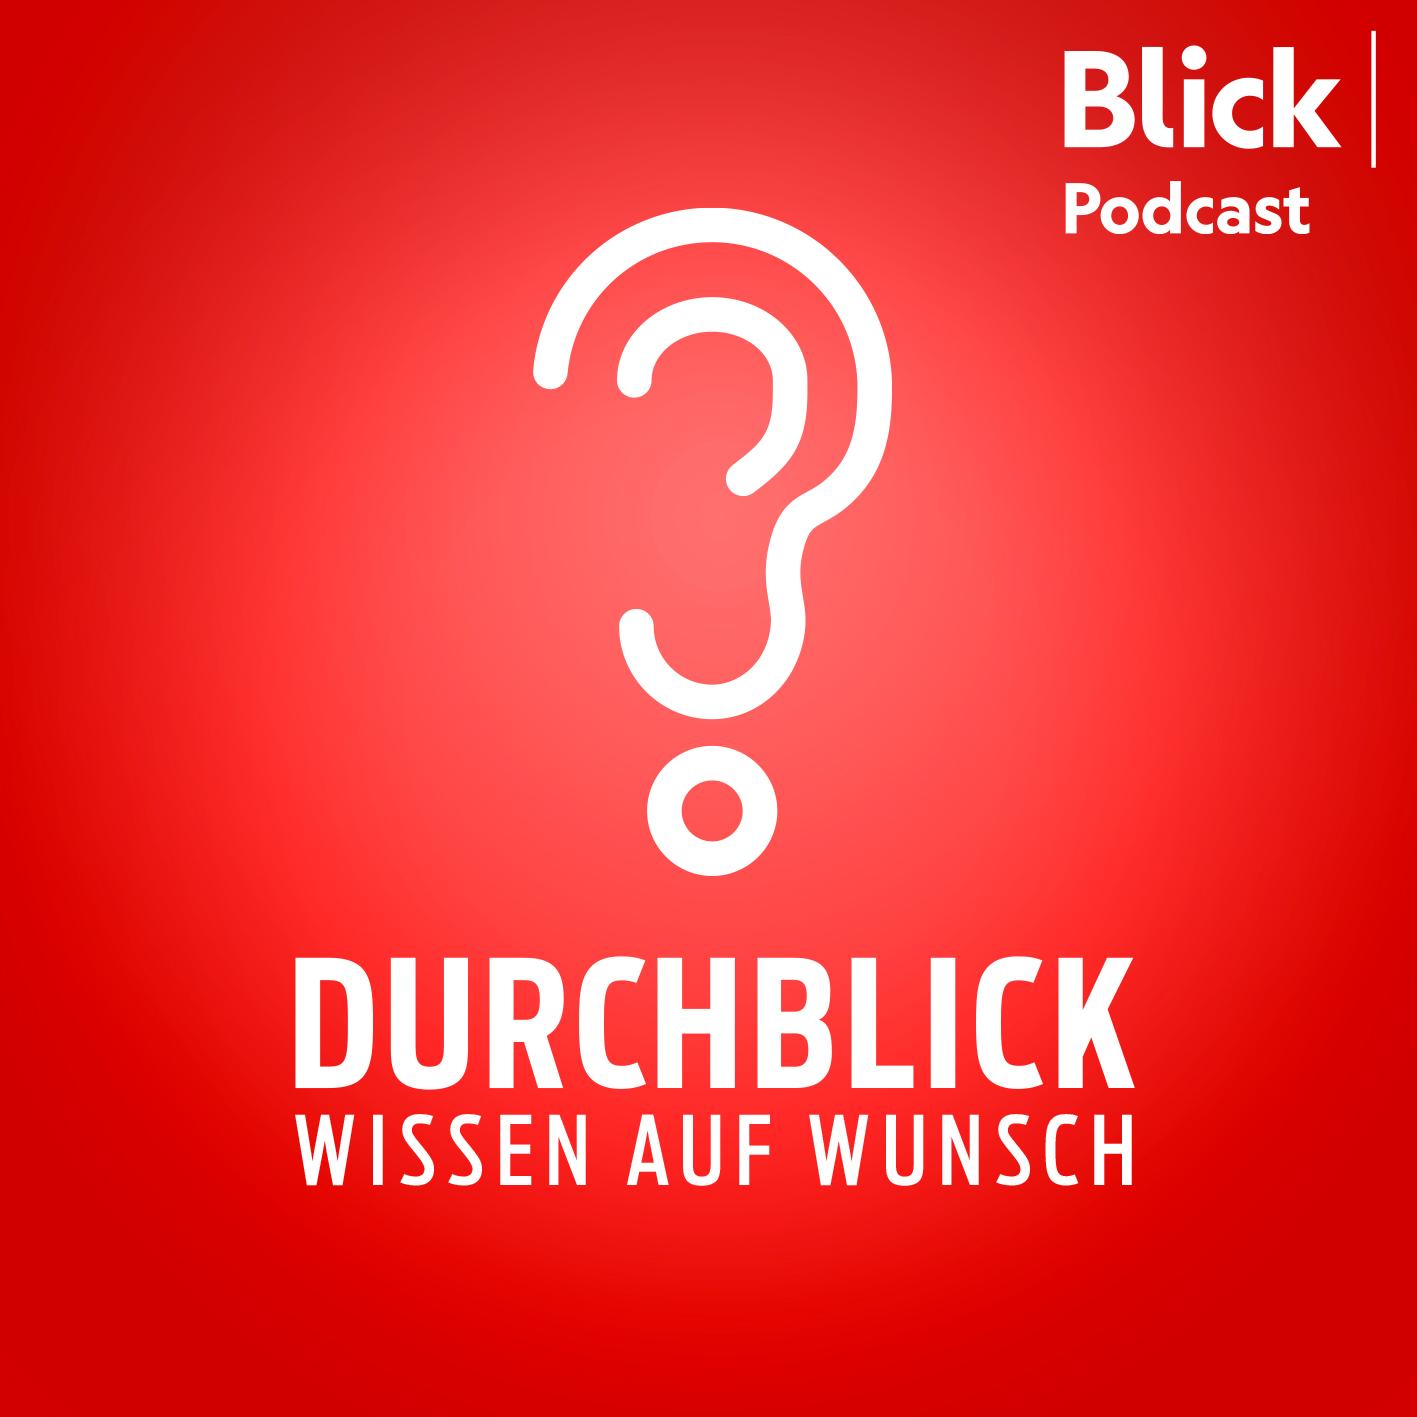 Logo_Durchblick